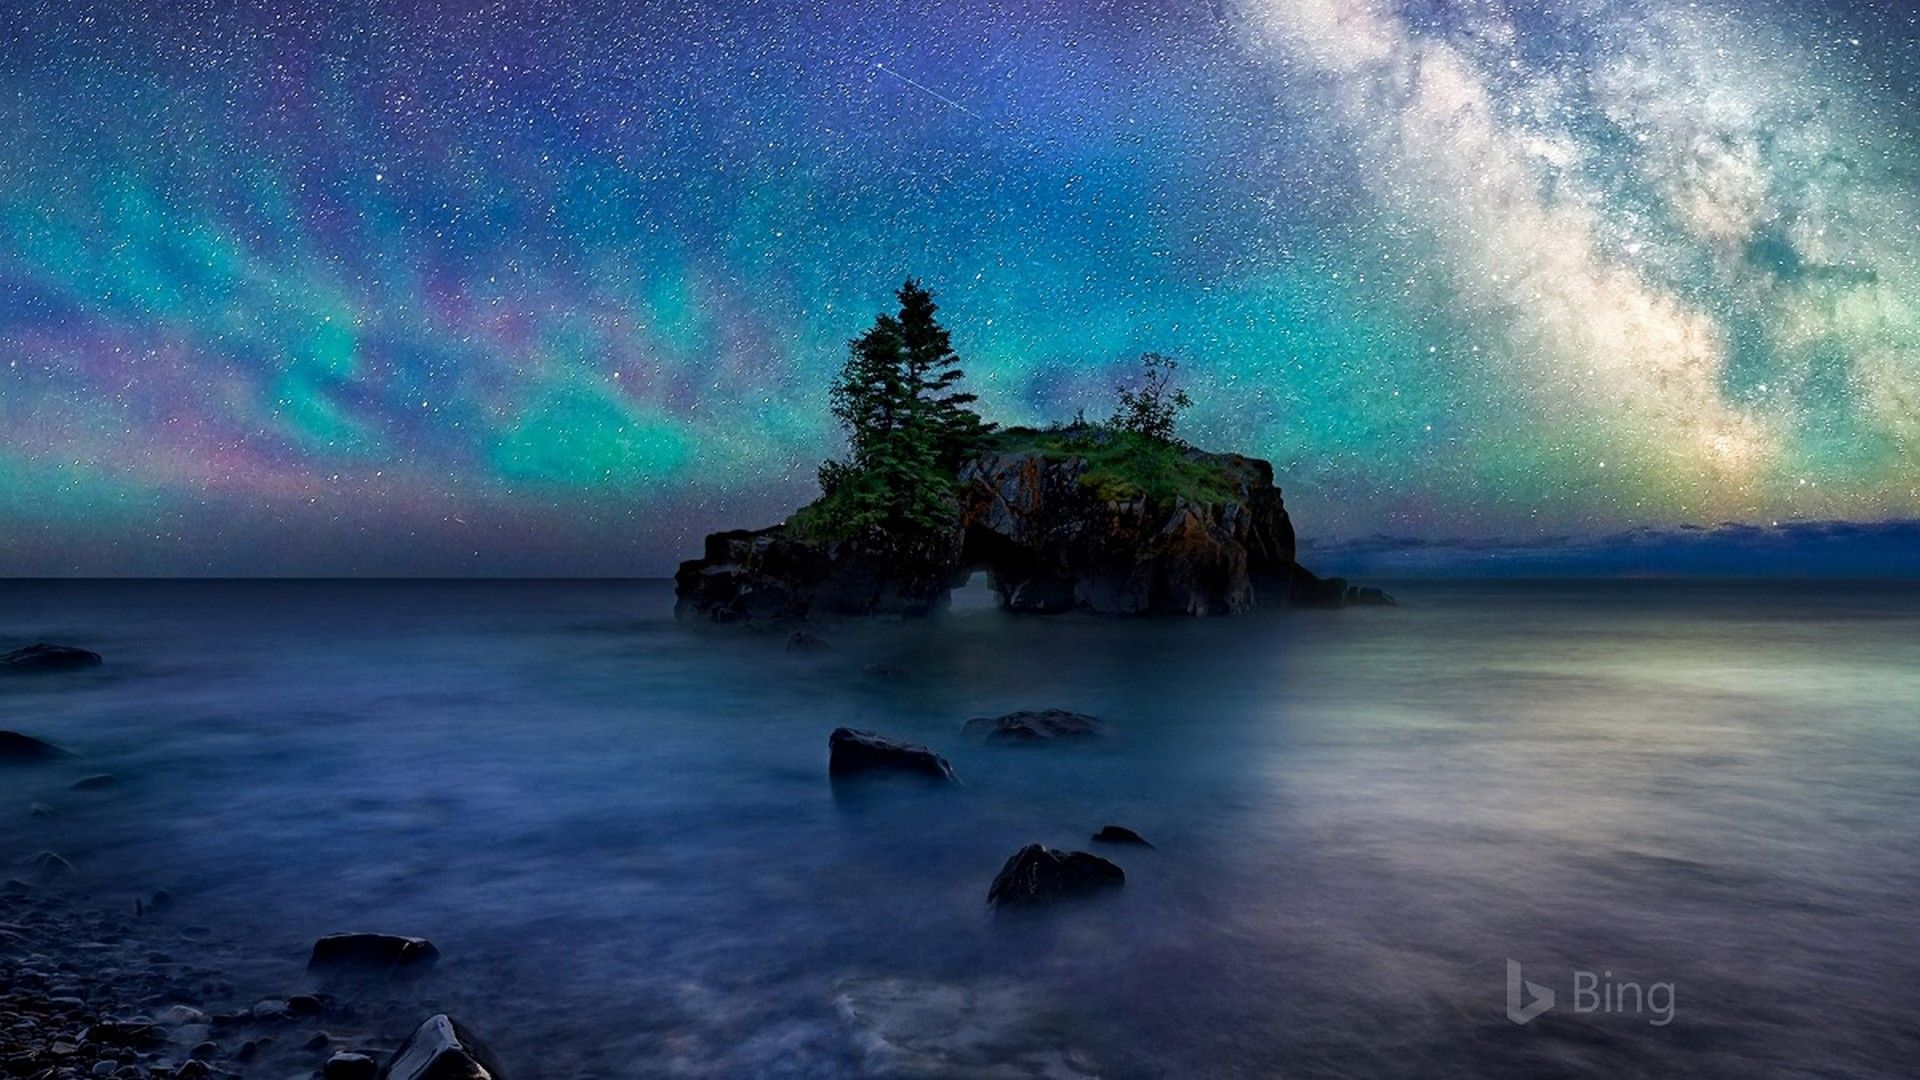 Desktop Wallpaper Windows 10 Best Wallpaper Hd Grand Portage Lake Superior Minnesota Vacation